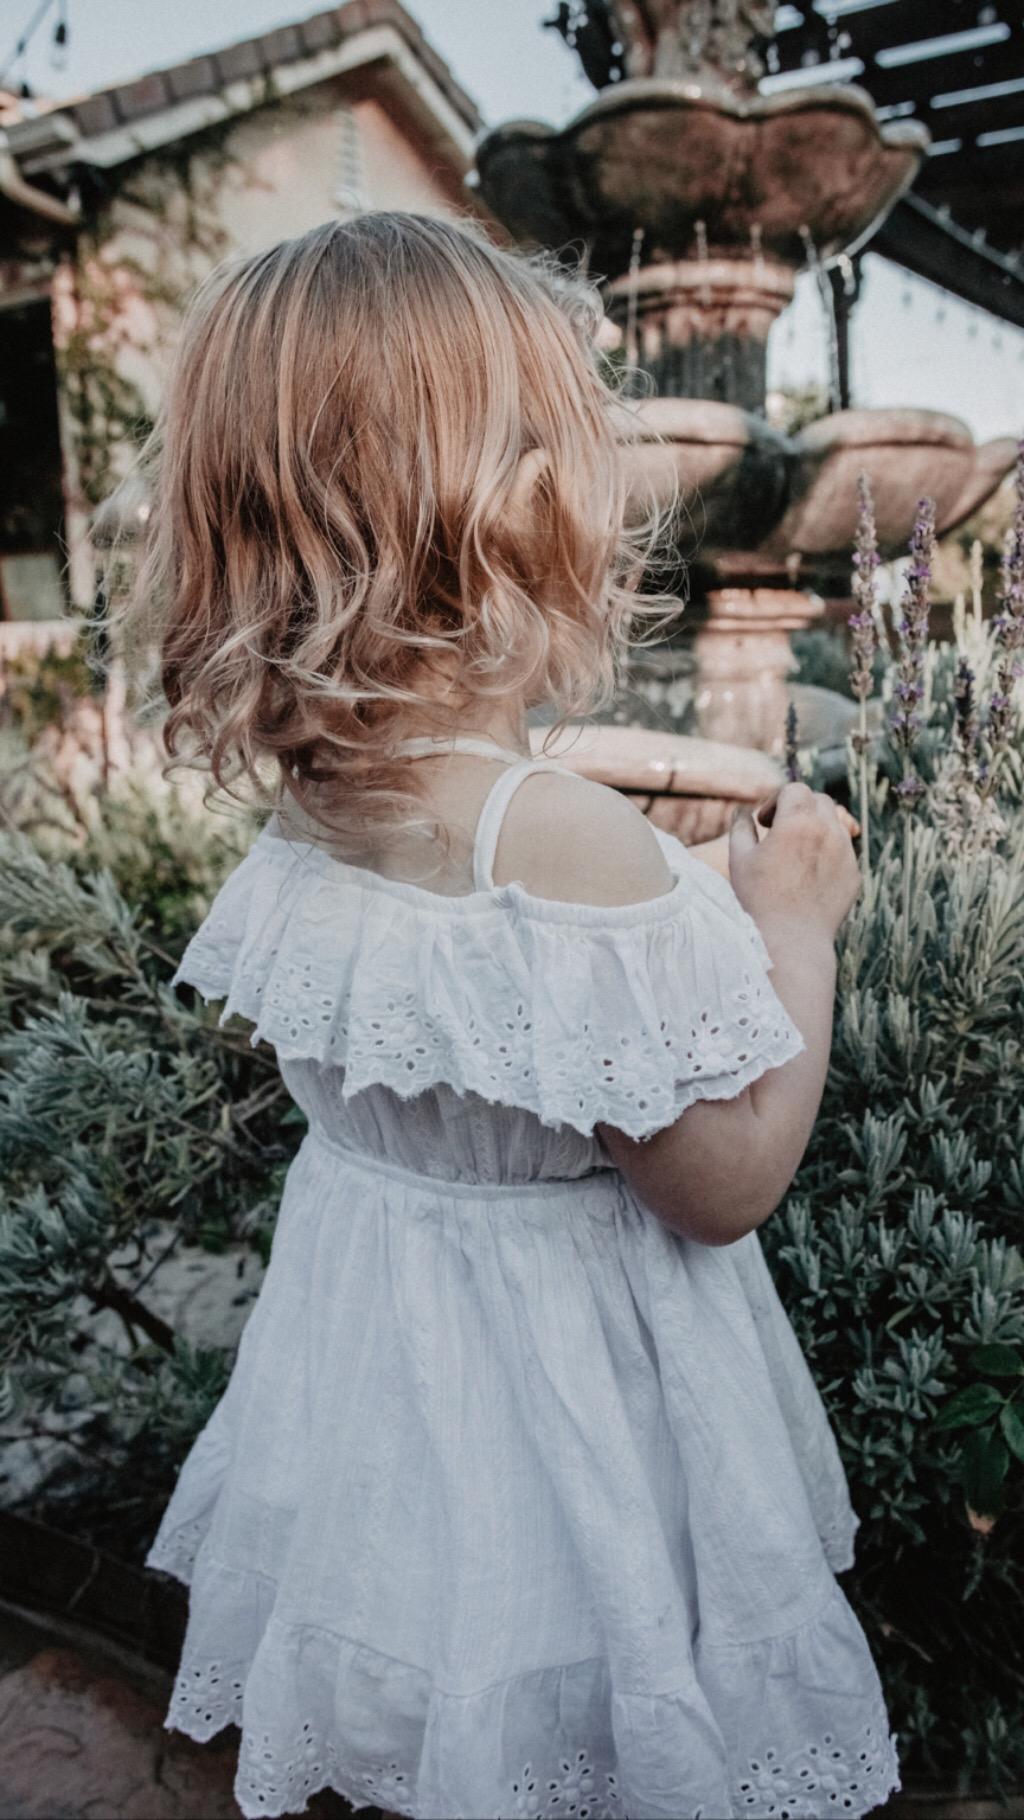 Child Photographer in San Diego